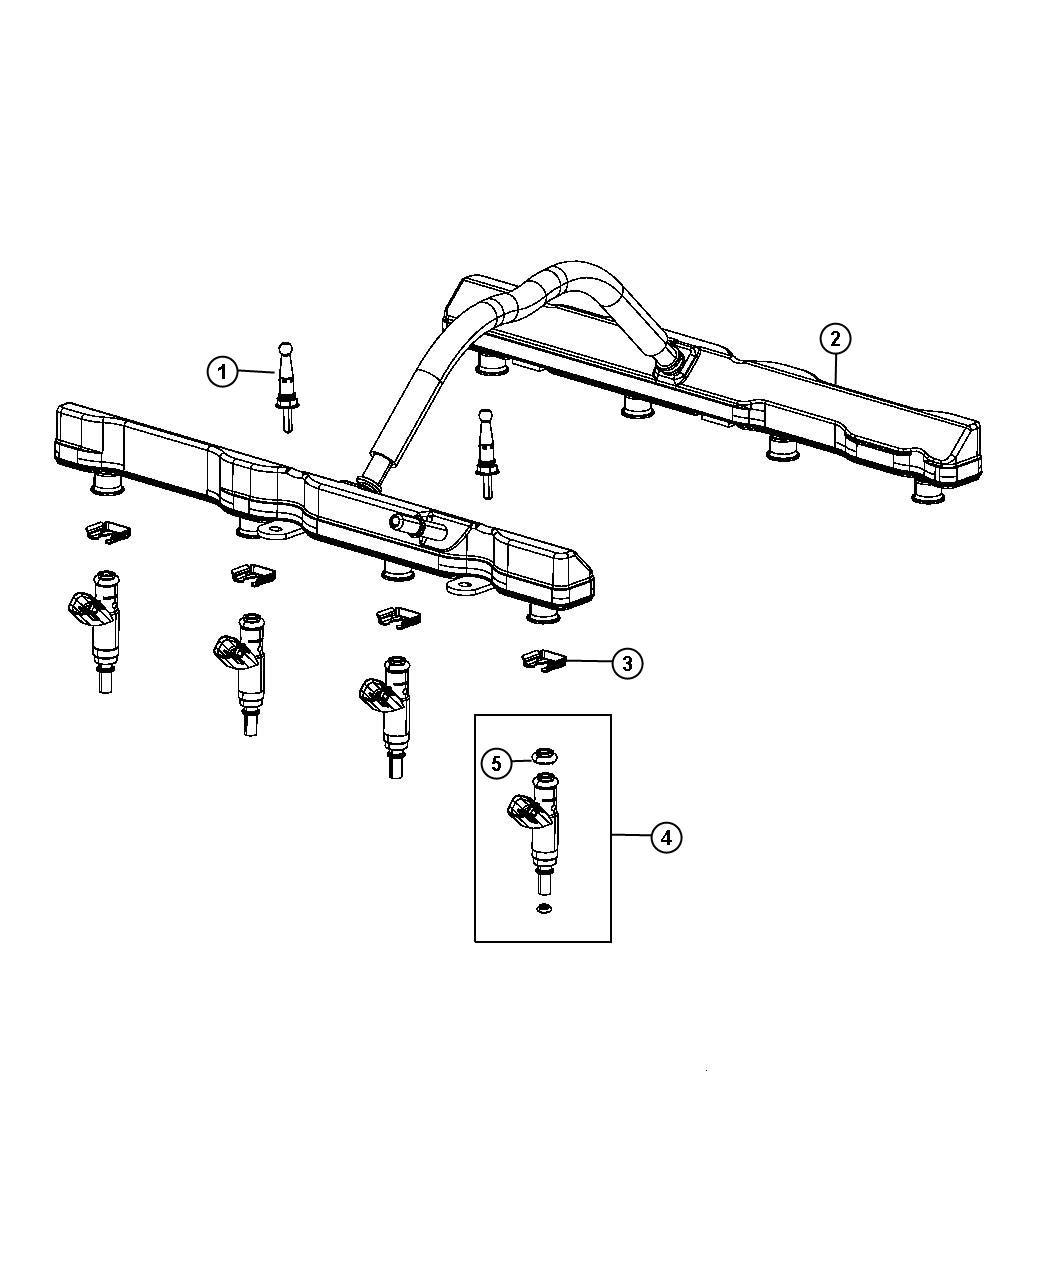 2002 acura tsx radio wiring diagram  acura  auto wiring